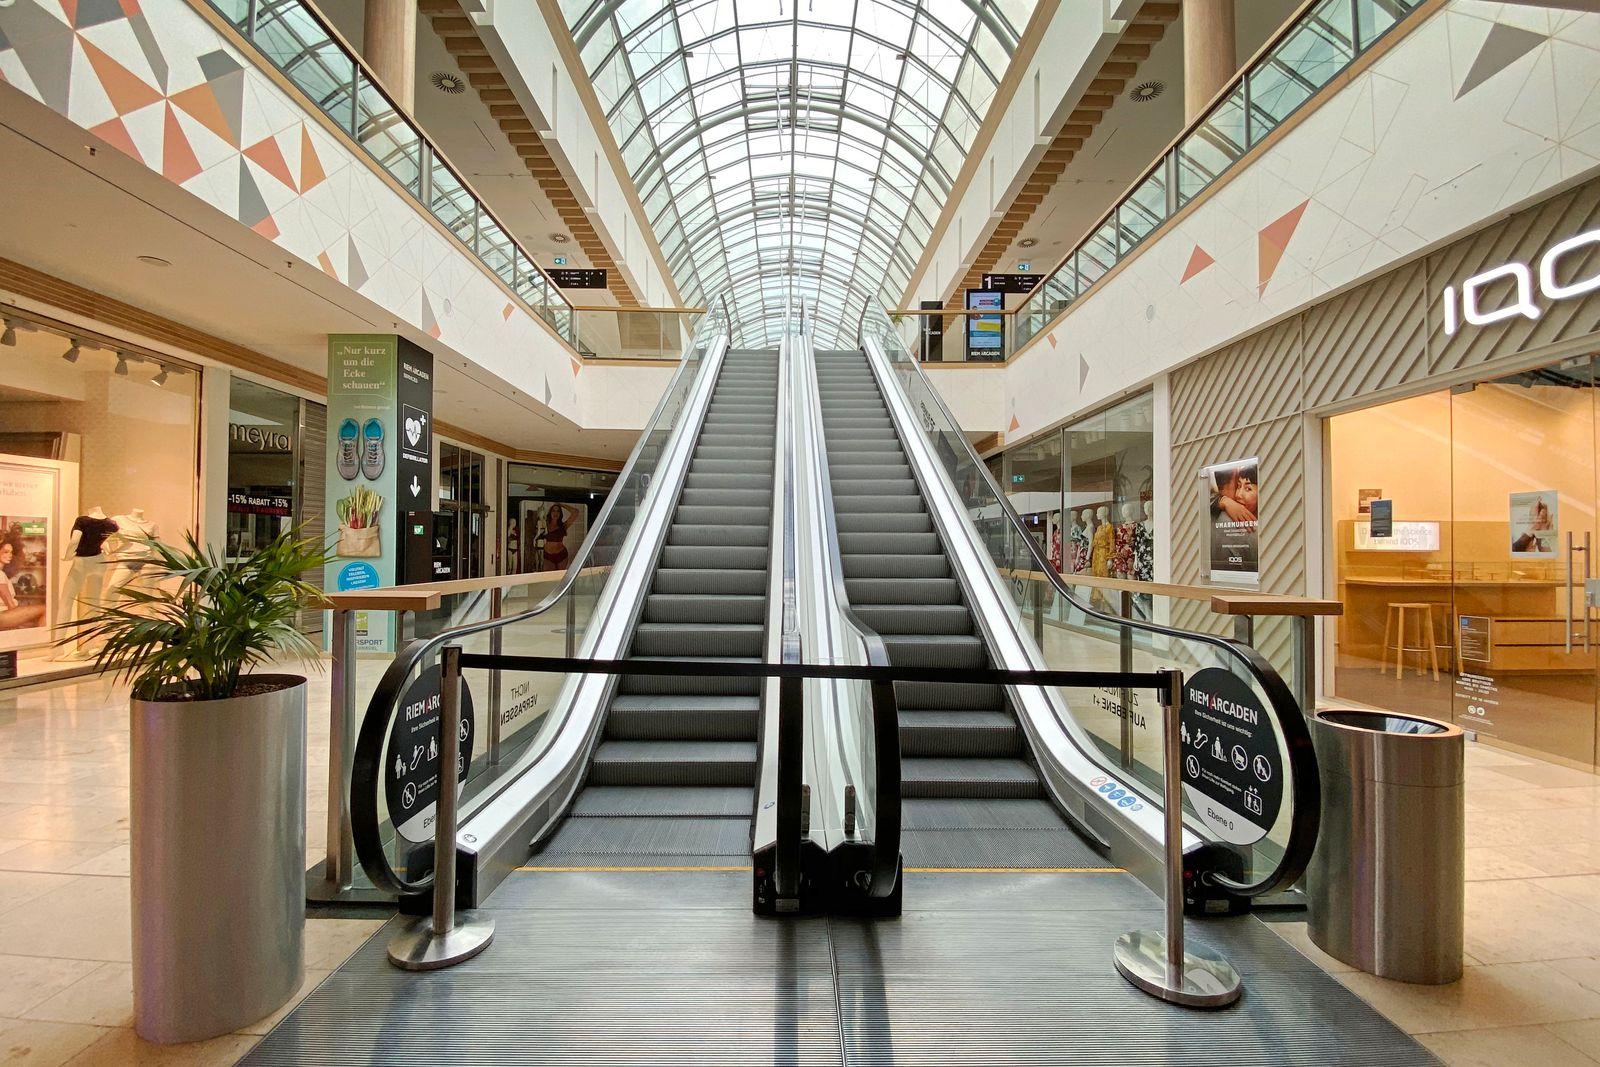 Geschlossenes Einkaufszentrum wegen Corona Pandemie